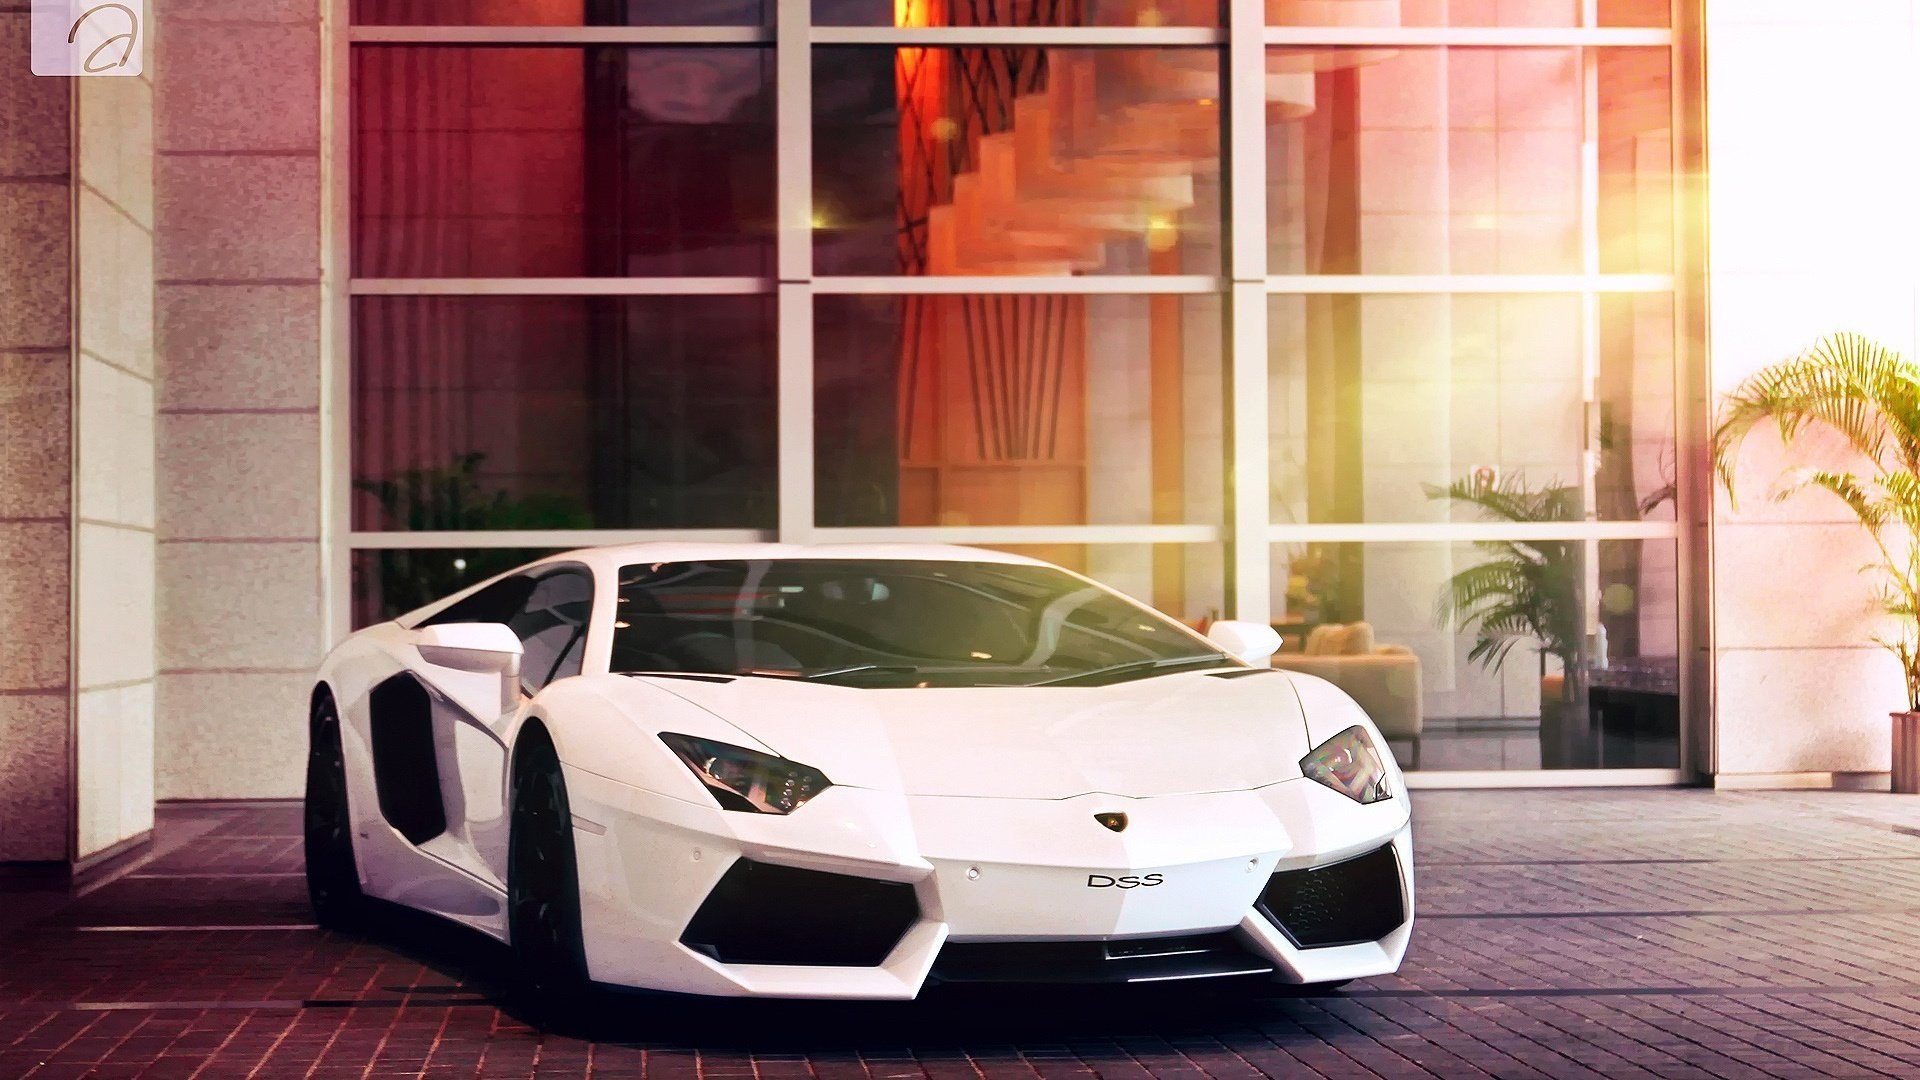 Lamborghini Aventador Wallpapers 1920x1080 Full Hd 1080p Desktop